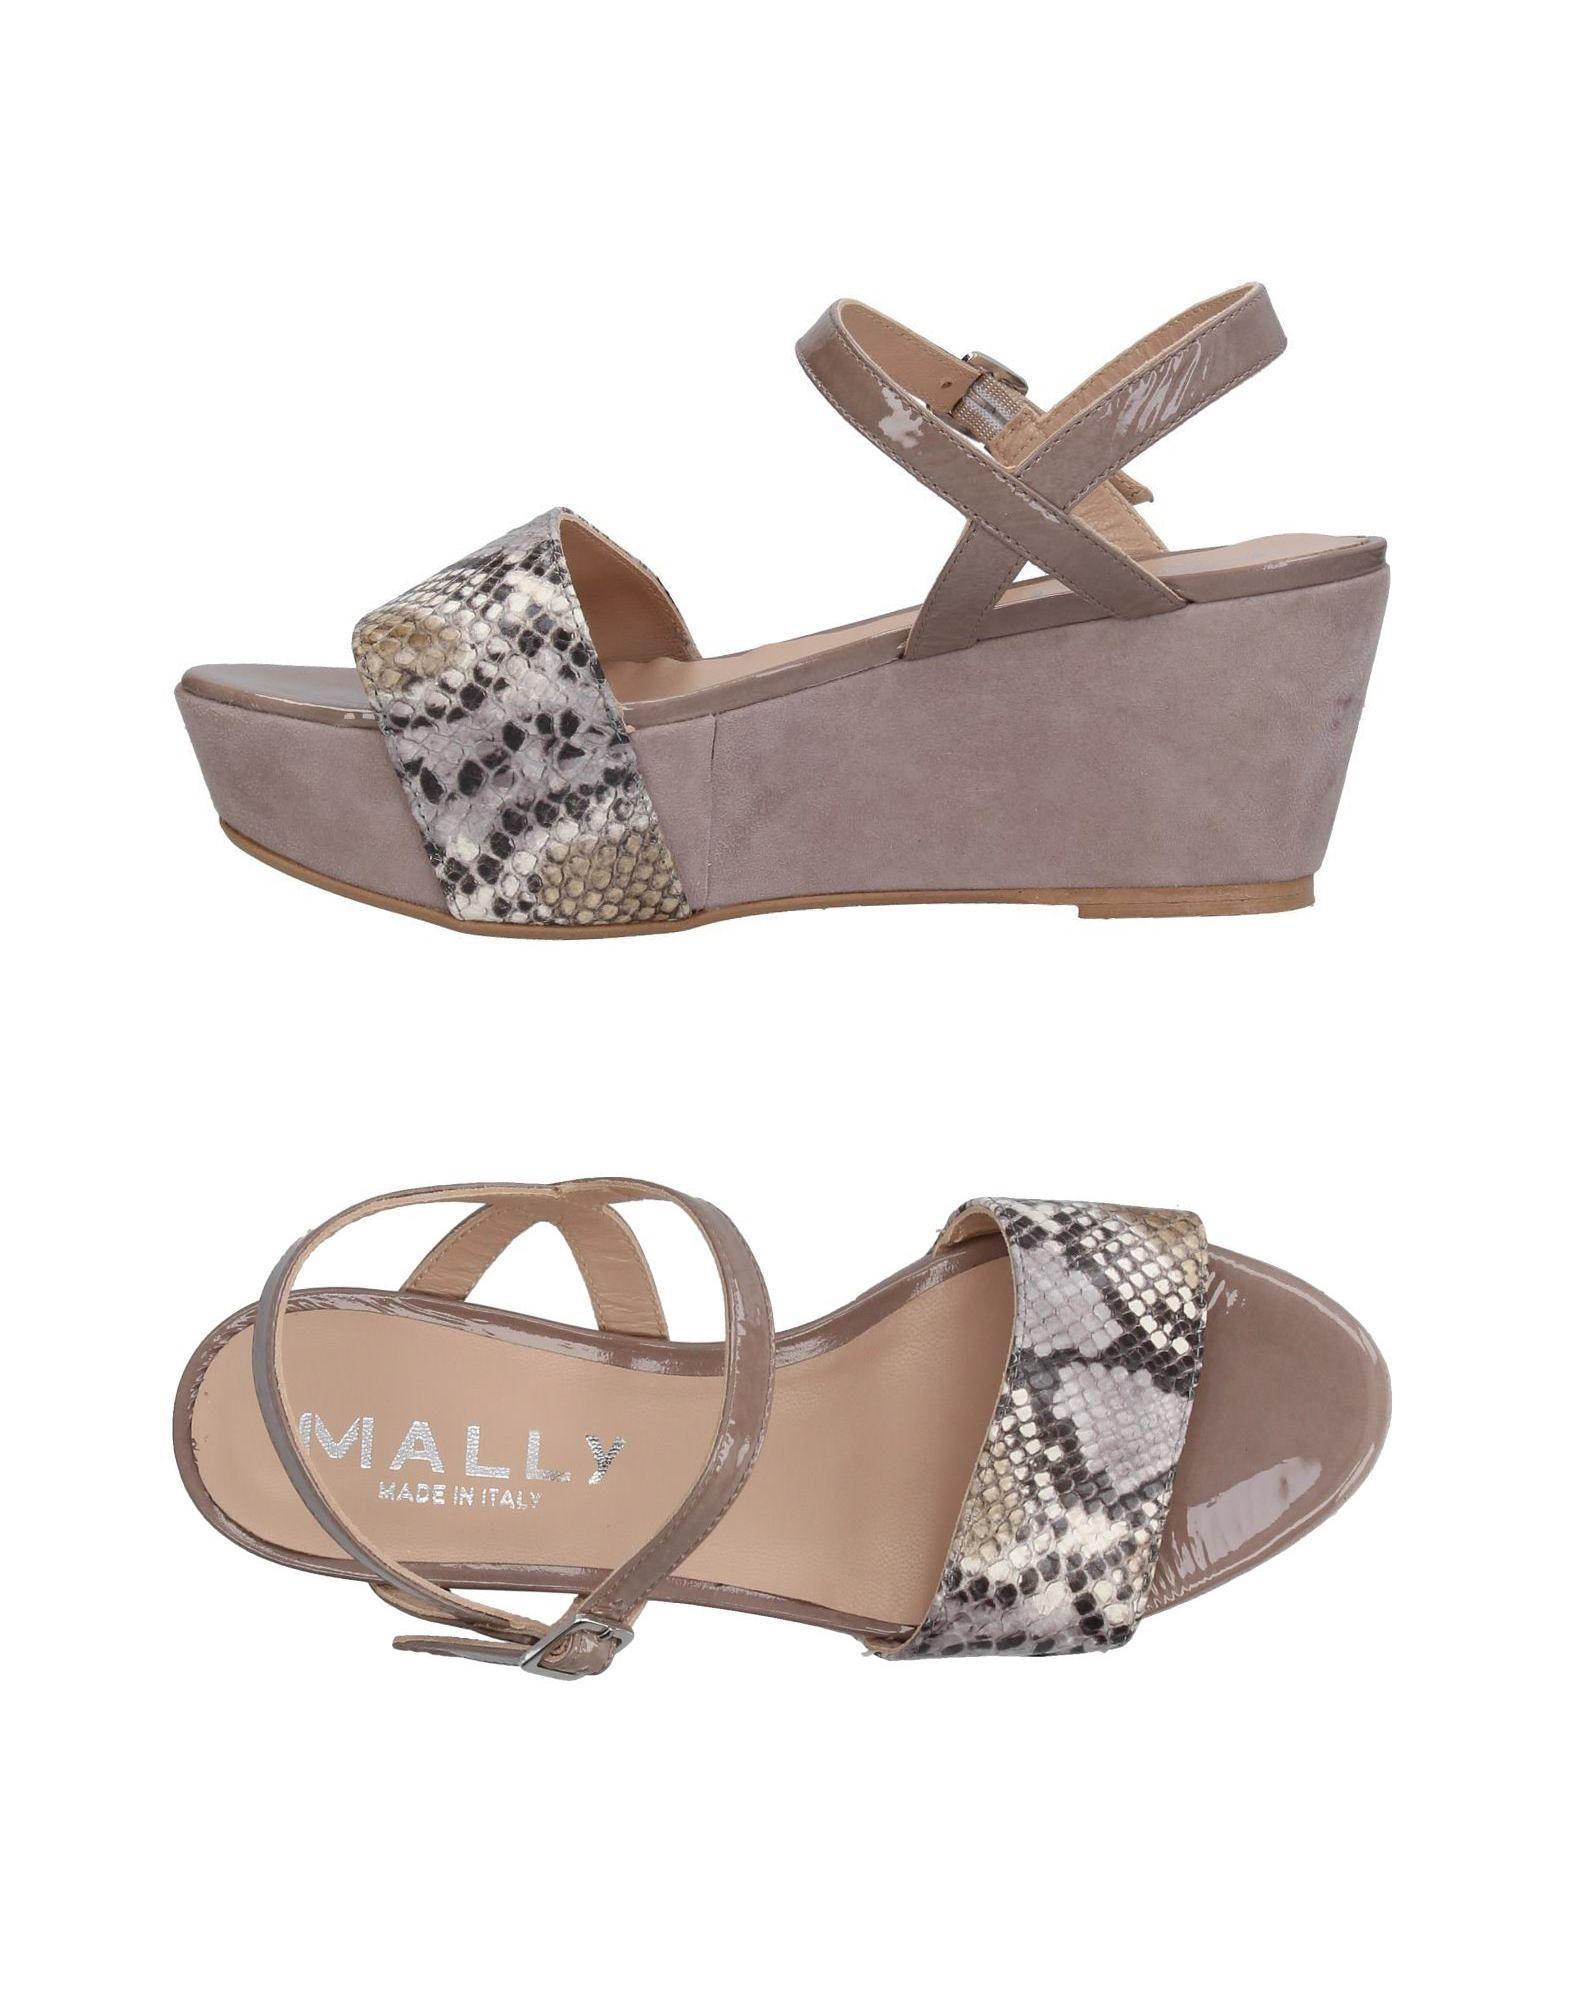 A buon mercato Sandali Mally Donna - 11375778KI